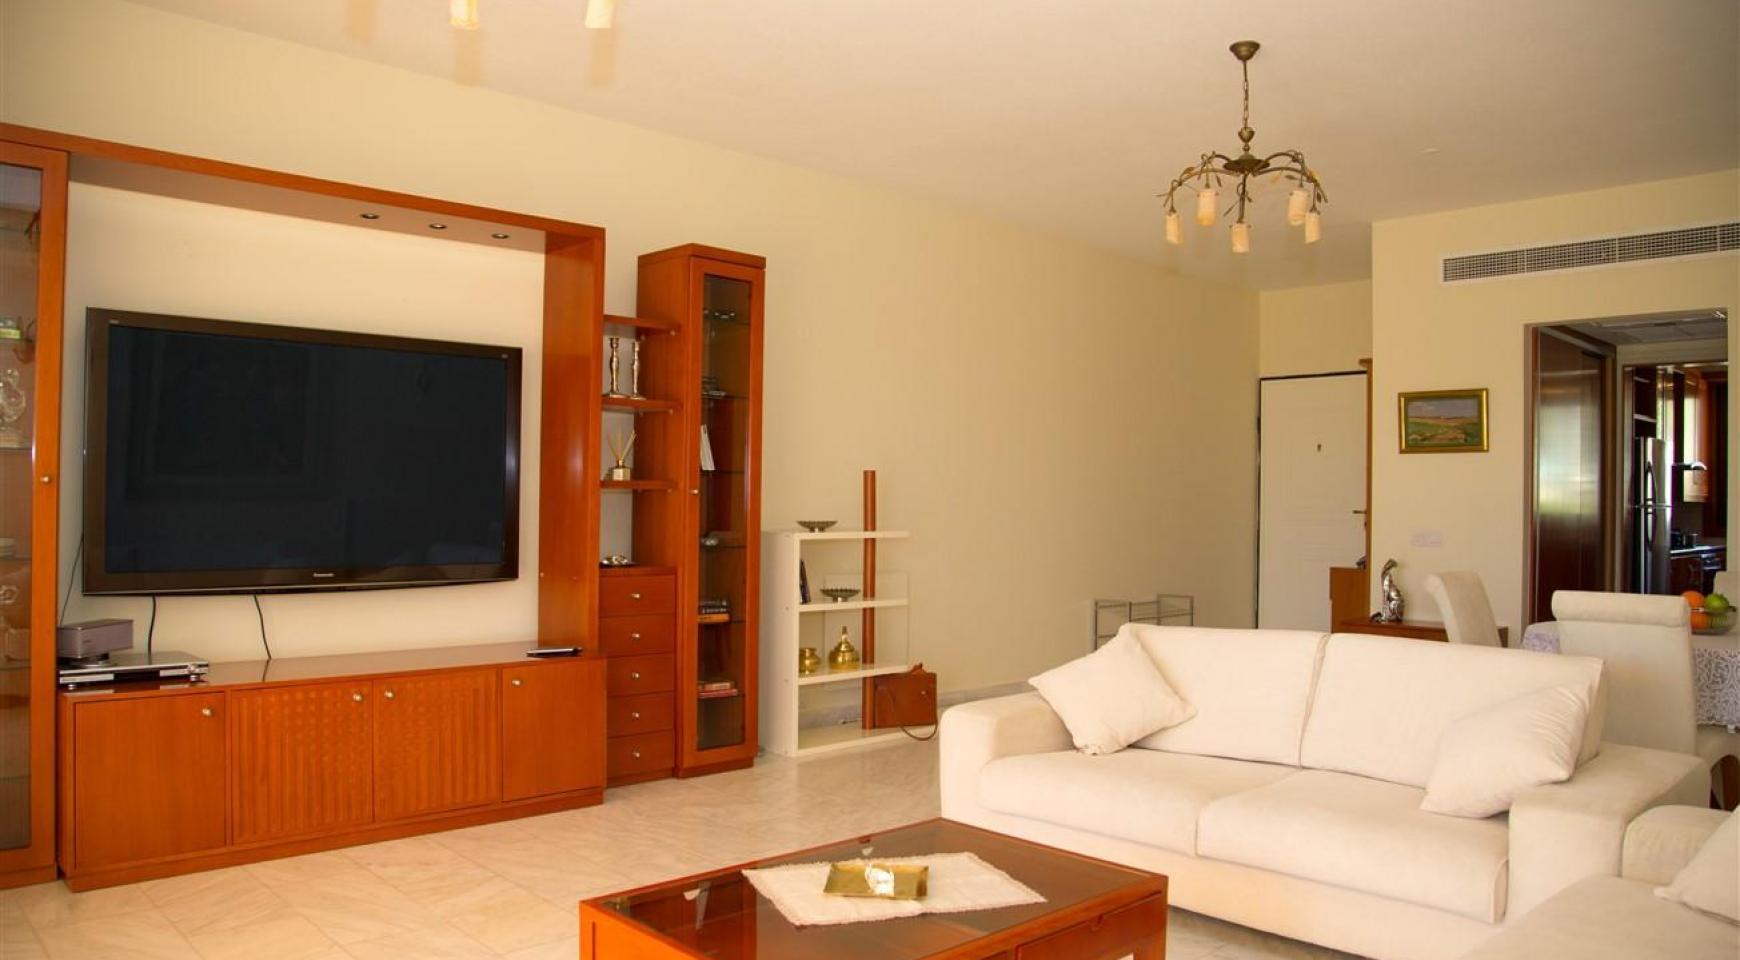 3-Спальная Квартира на Берегу Моря в Комплексе Thera   - 20